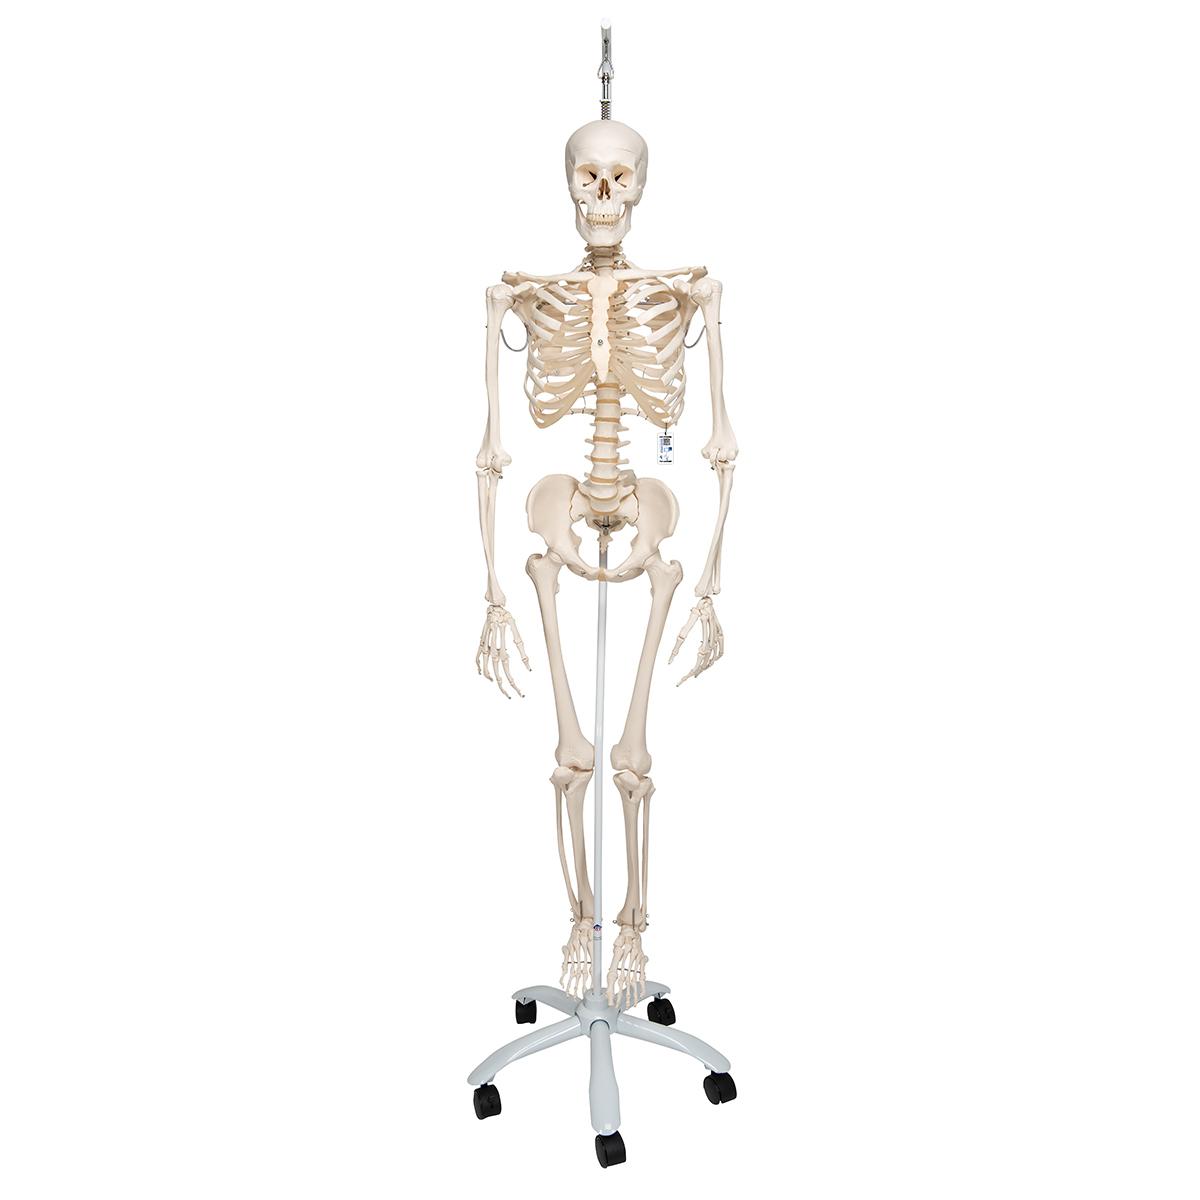 Skelett Phil A15/3, das physiologische Skelett an Metallhängestativ ...